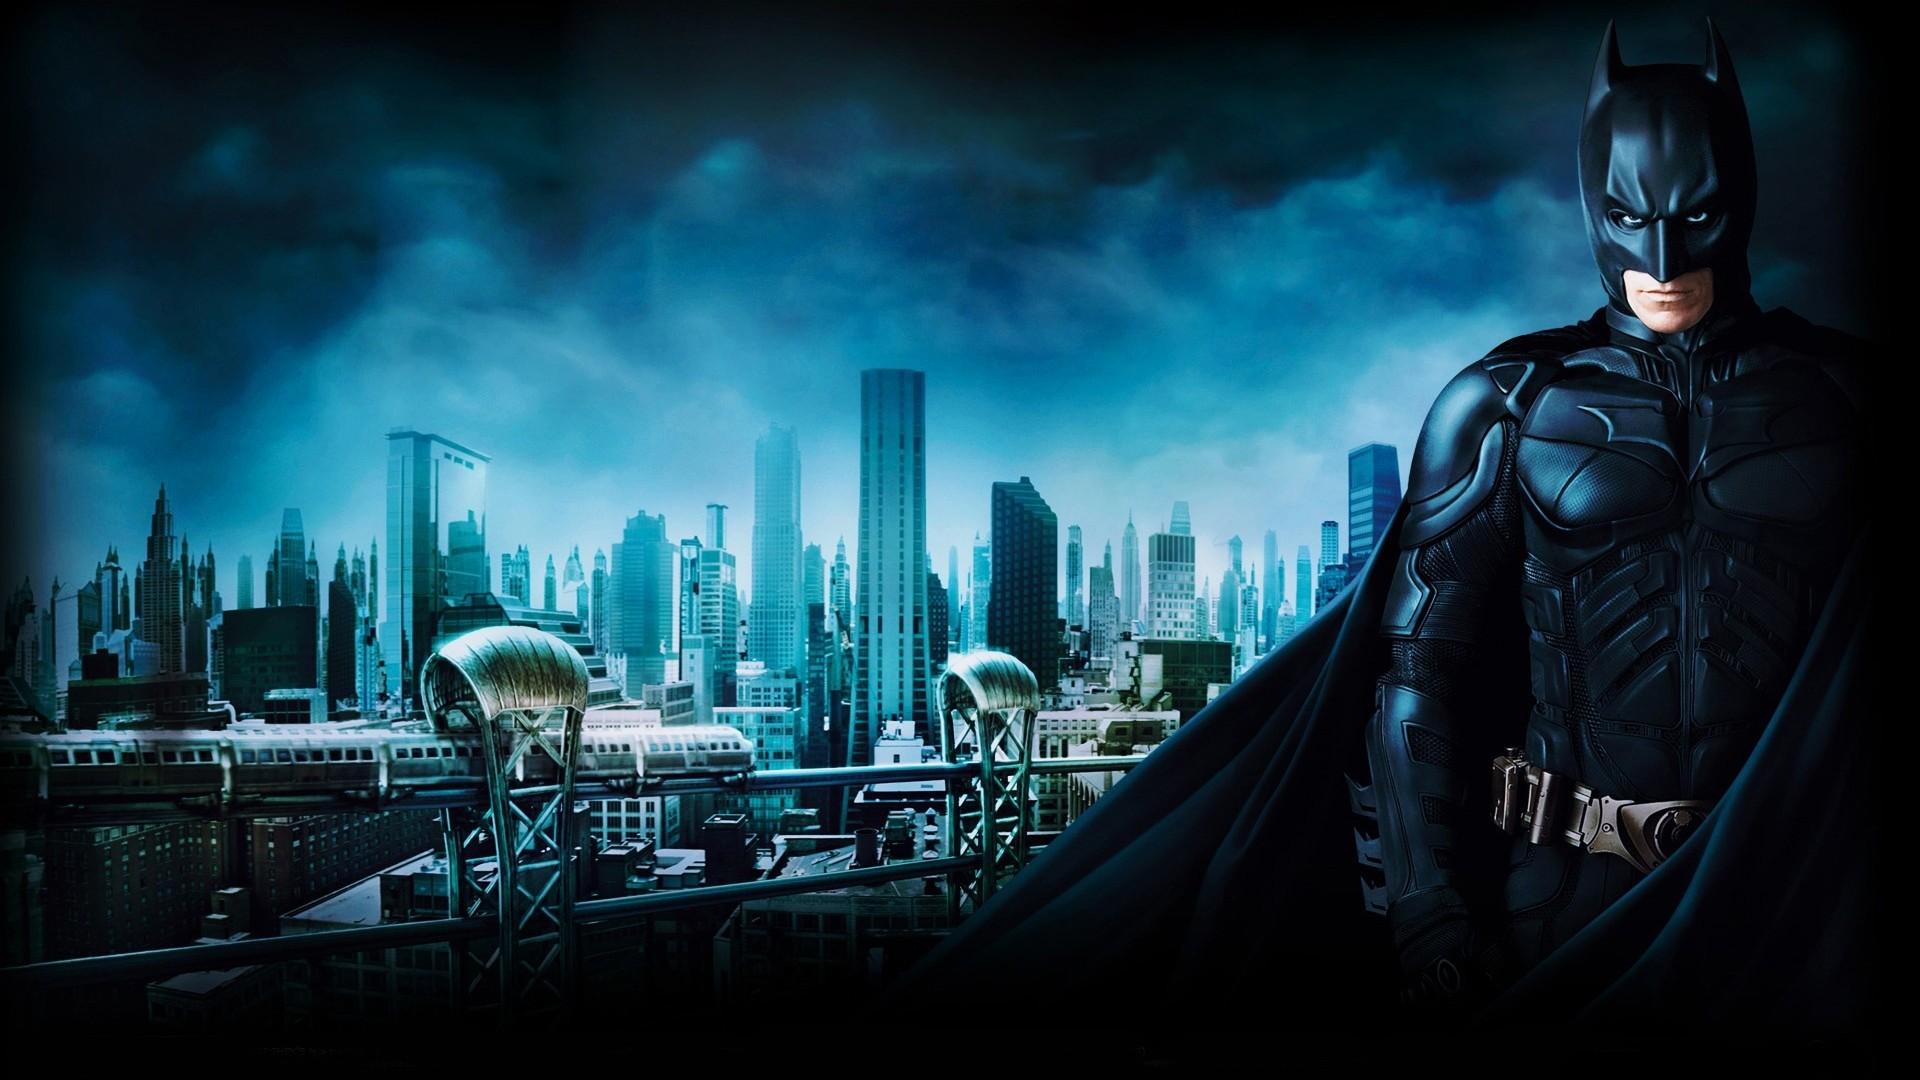 uploads201305Batman Begins Gotham Train Desktop Wallpaperjpg 1920x1080